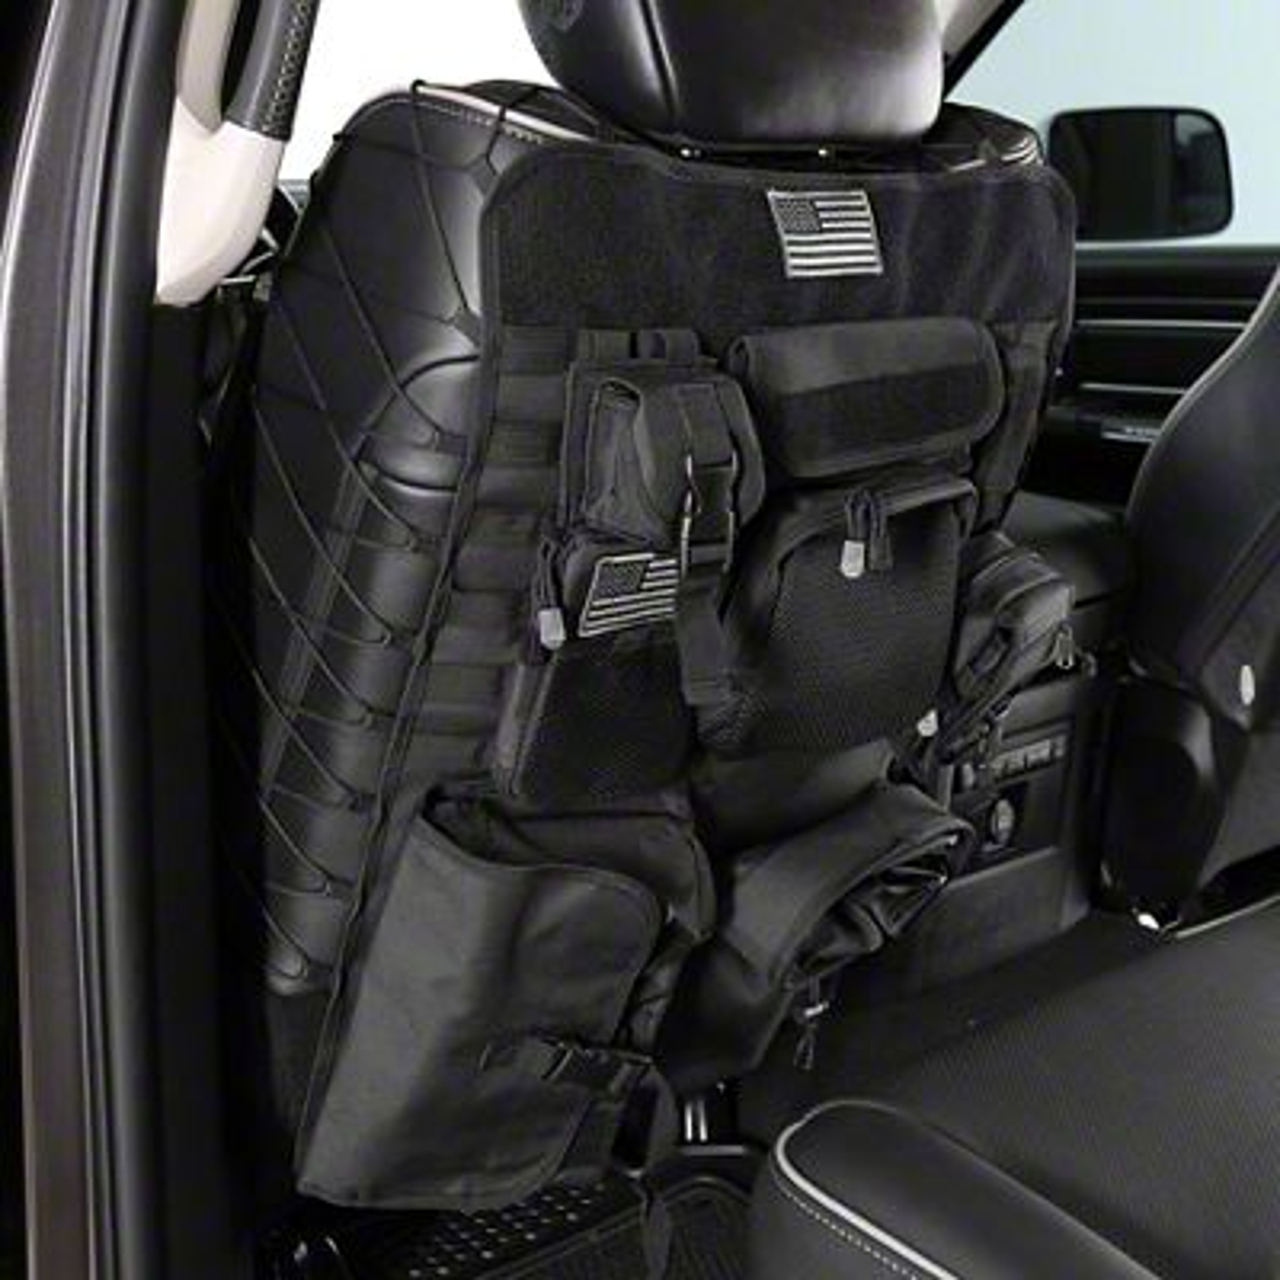 Smittybilt G.E.A.R. Front Seat Covers - Black (02-19 RAM 1500)